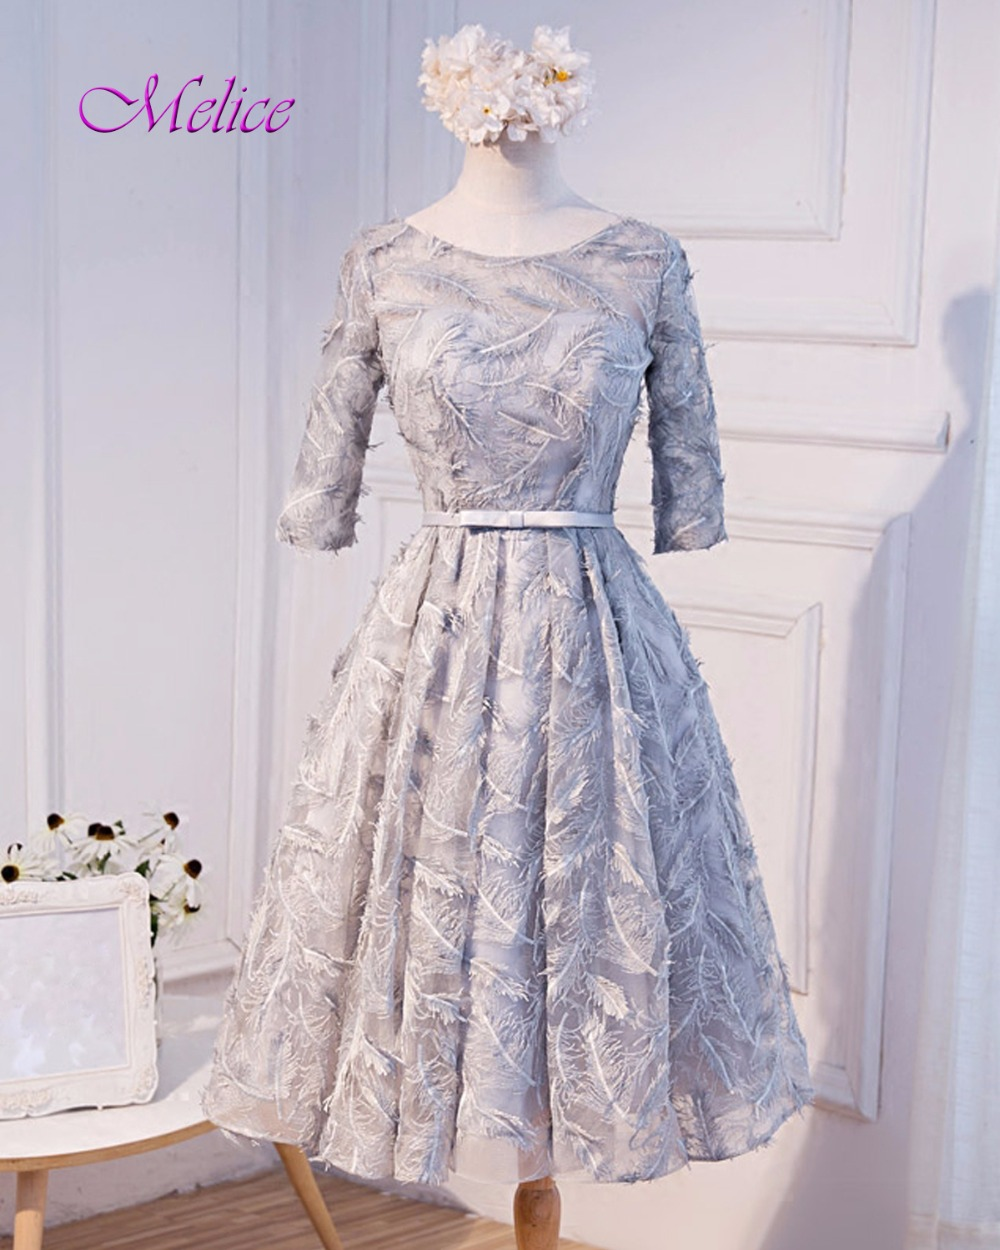 Fmogl Fashion Scoop Neck Feathers Lace Prom Dress 2018 Hot Sale Backless Sashes Formal Evening Gown Vestido de Festa Plus Size